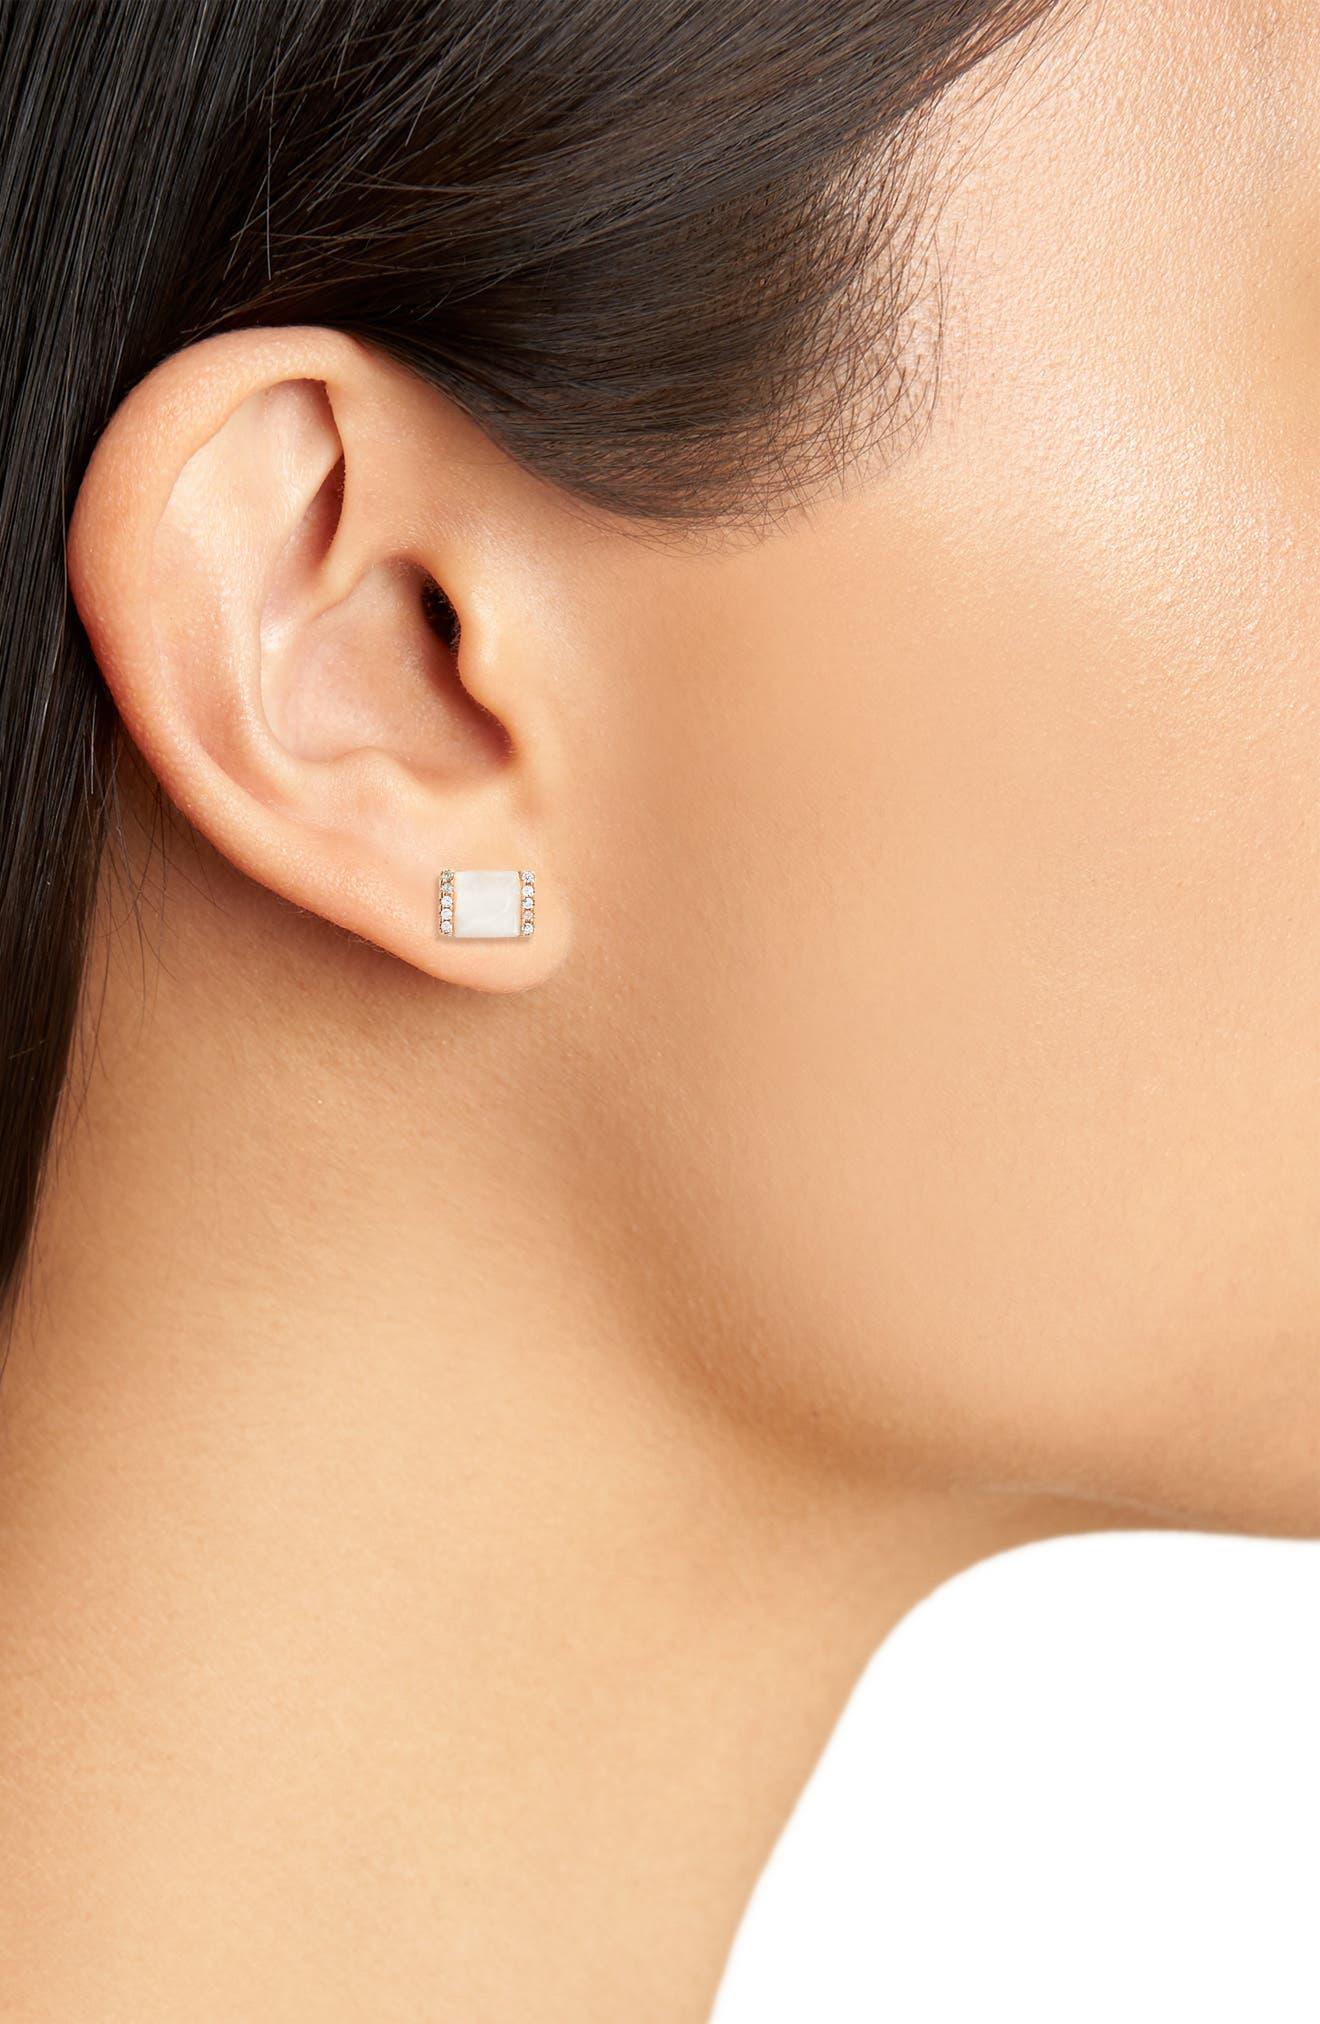 Vero Stud Earrings,                             Alternate thumbnail 2, color,                             Moonstone/ Gold